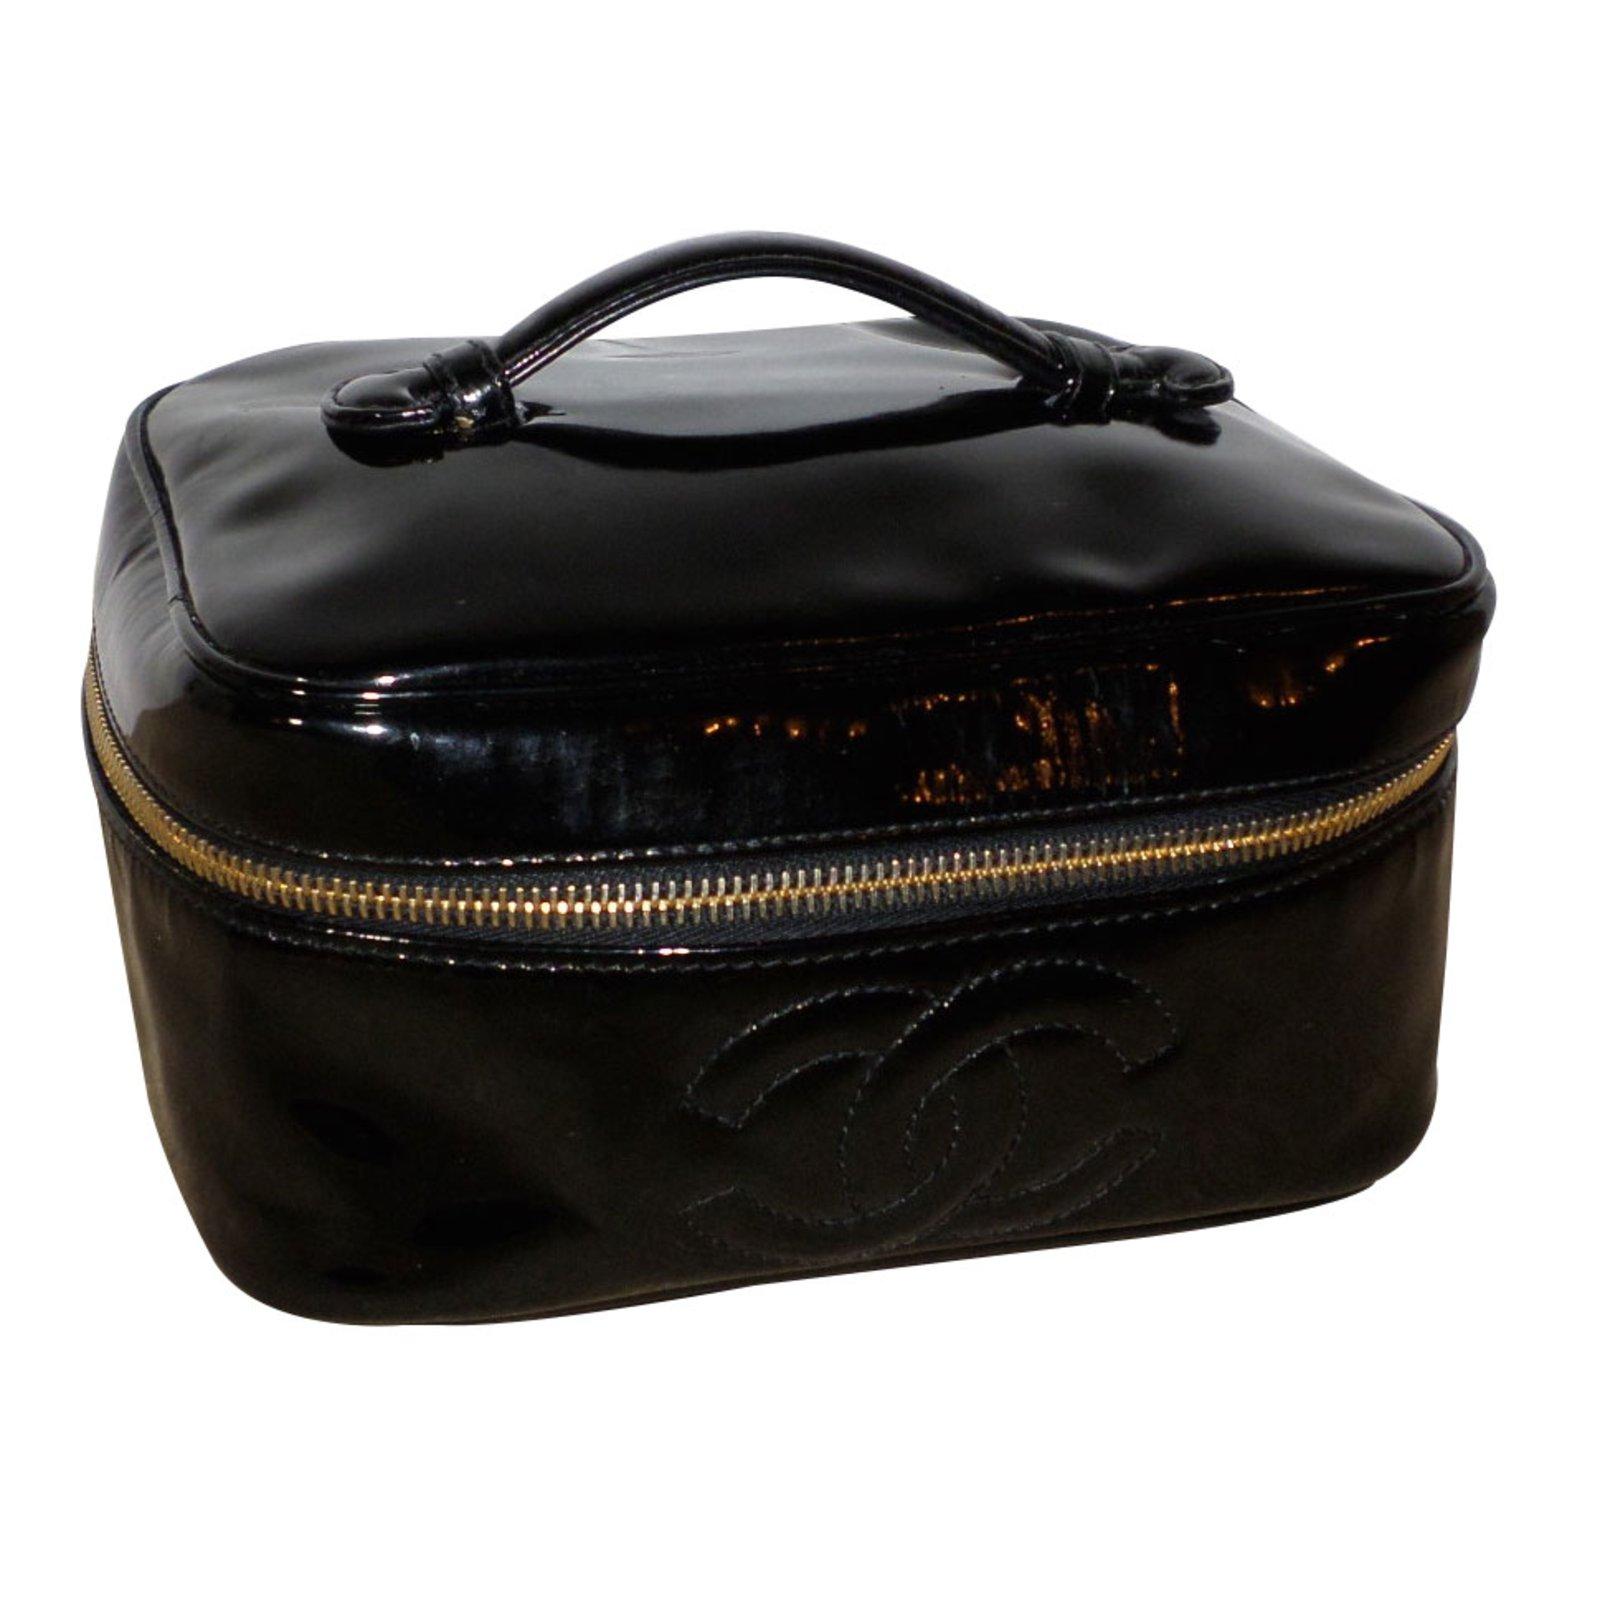 6b1a862368e8 Chanel Vanity Case Purses, wallets, cases Patent leather Black ref.25217